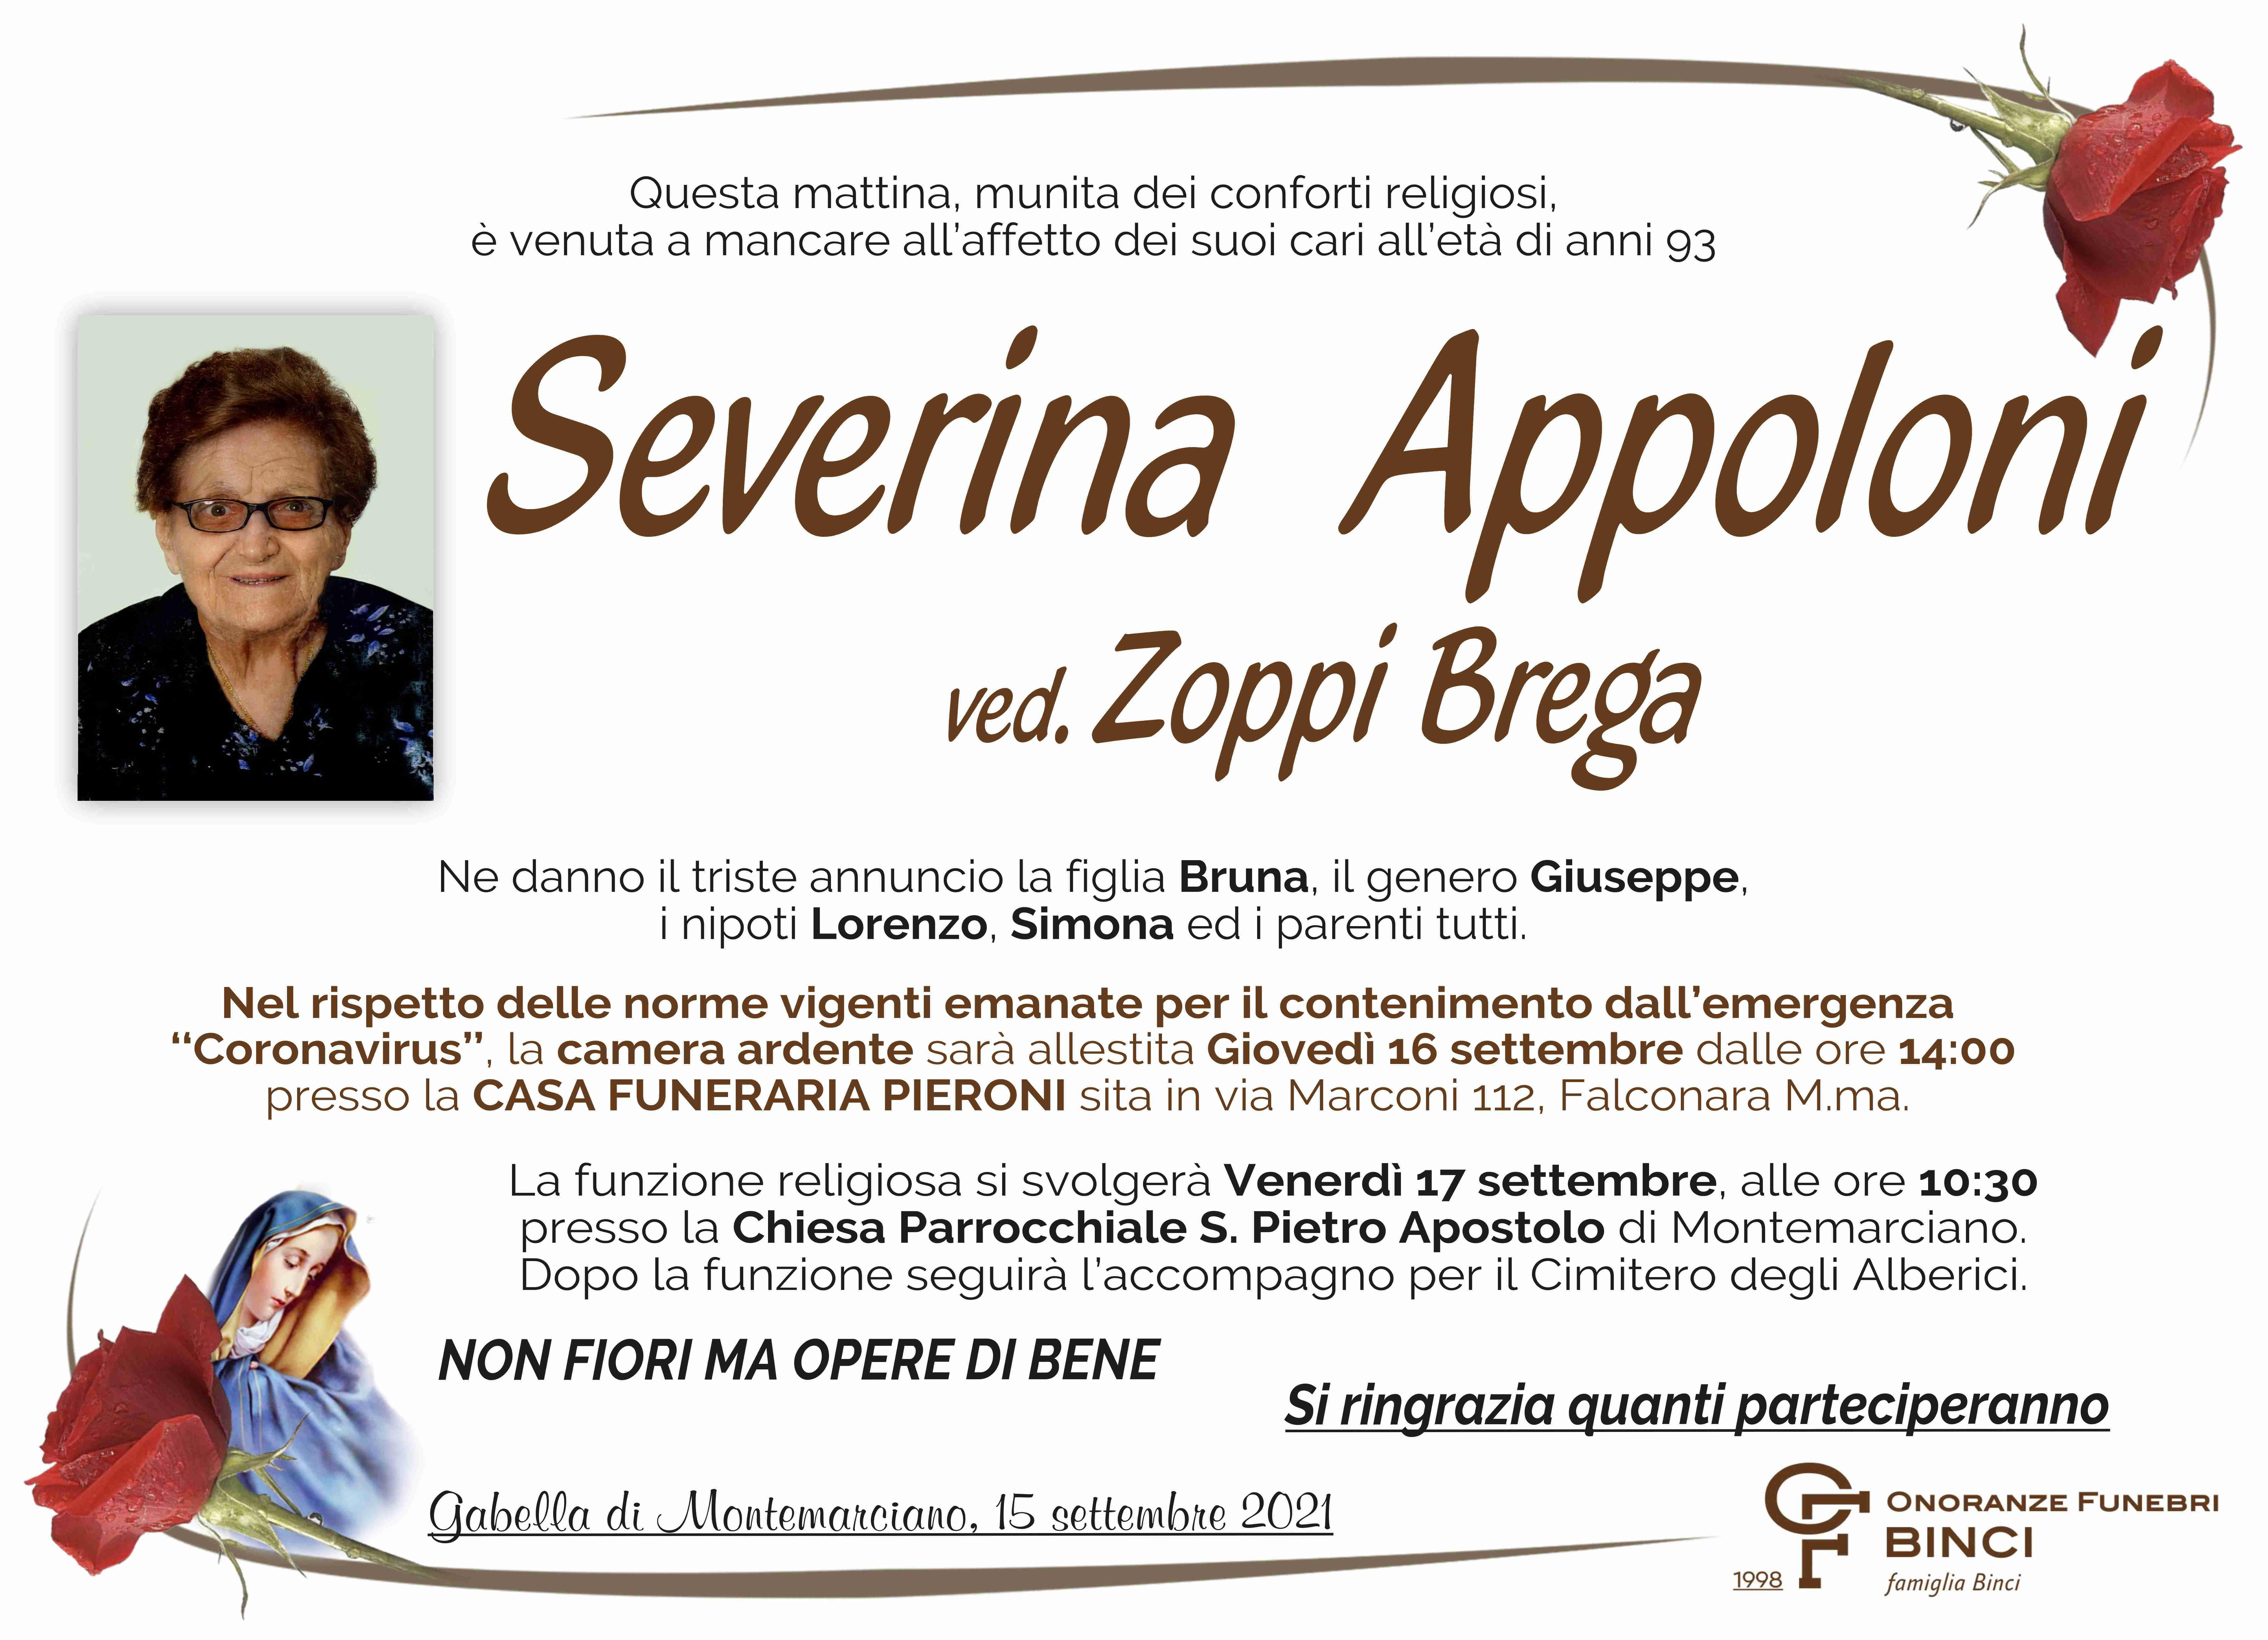 Severina Appoloni